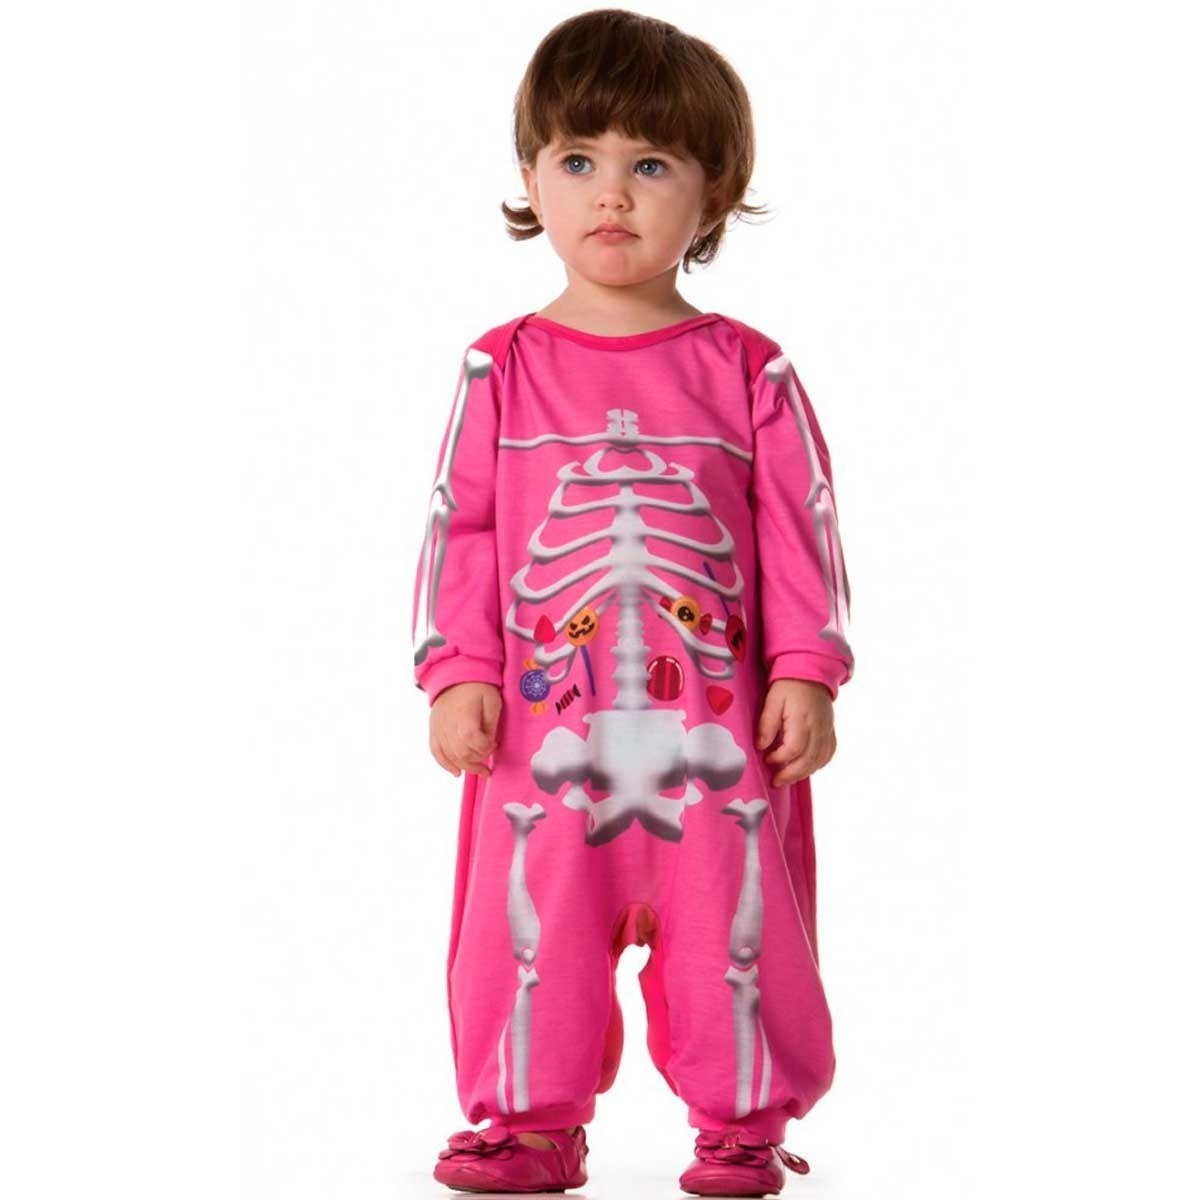 f4056d9db24e16 Fantasia Para Bebê De Halloween Menina Esqueleto 3/18 Meses